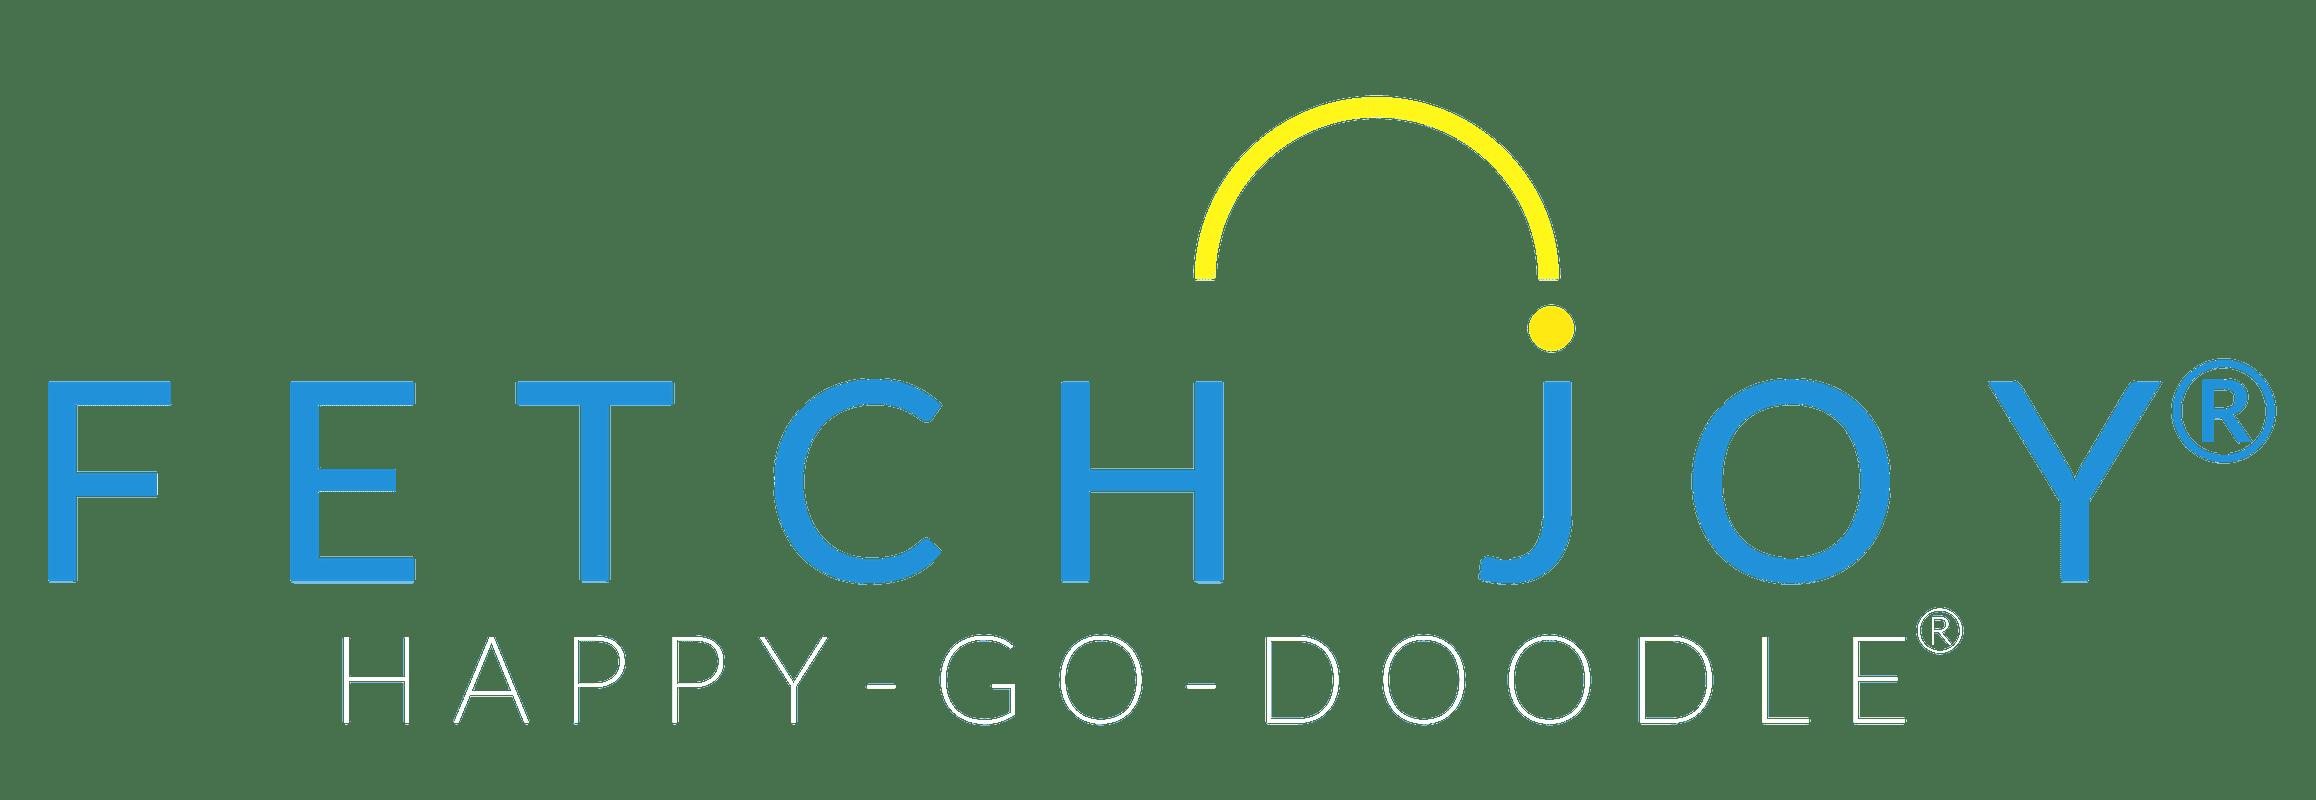 Happy-Go-Doodle®